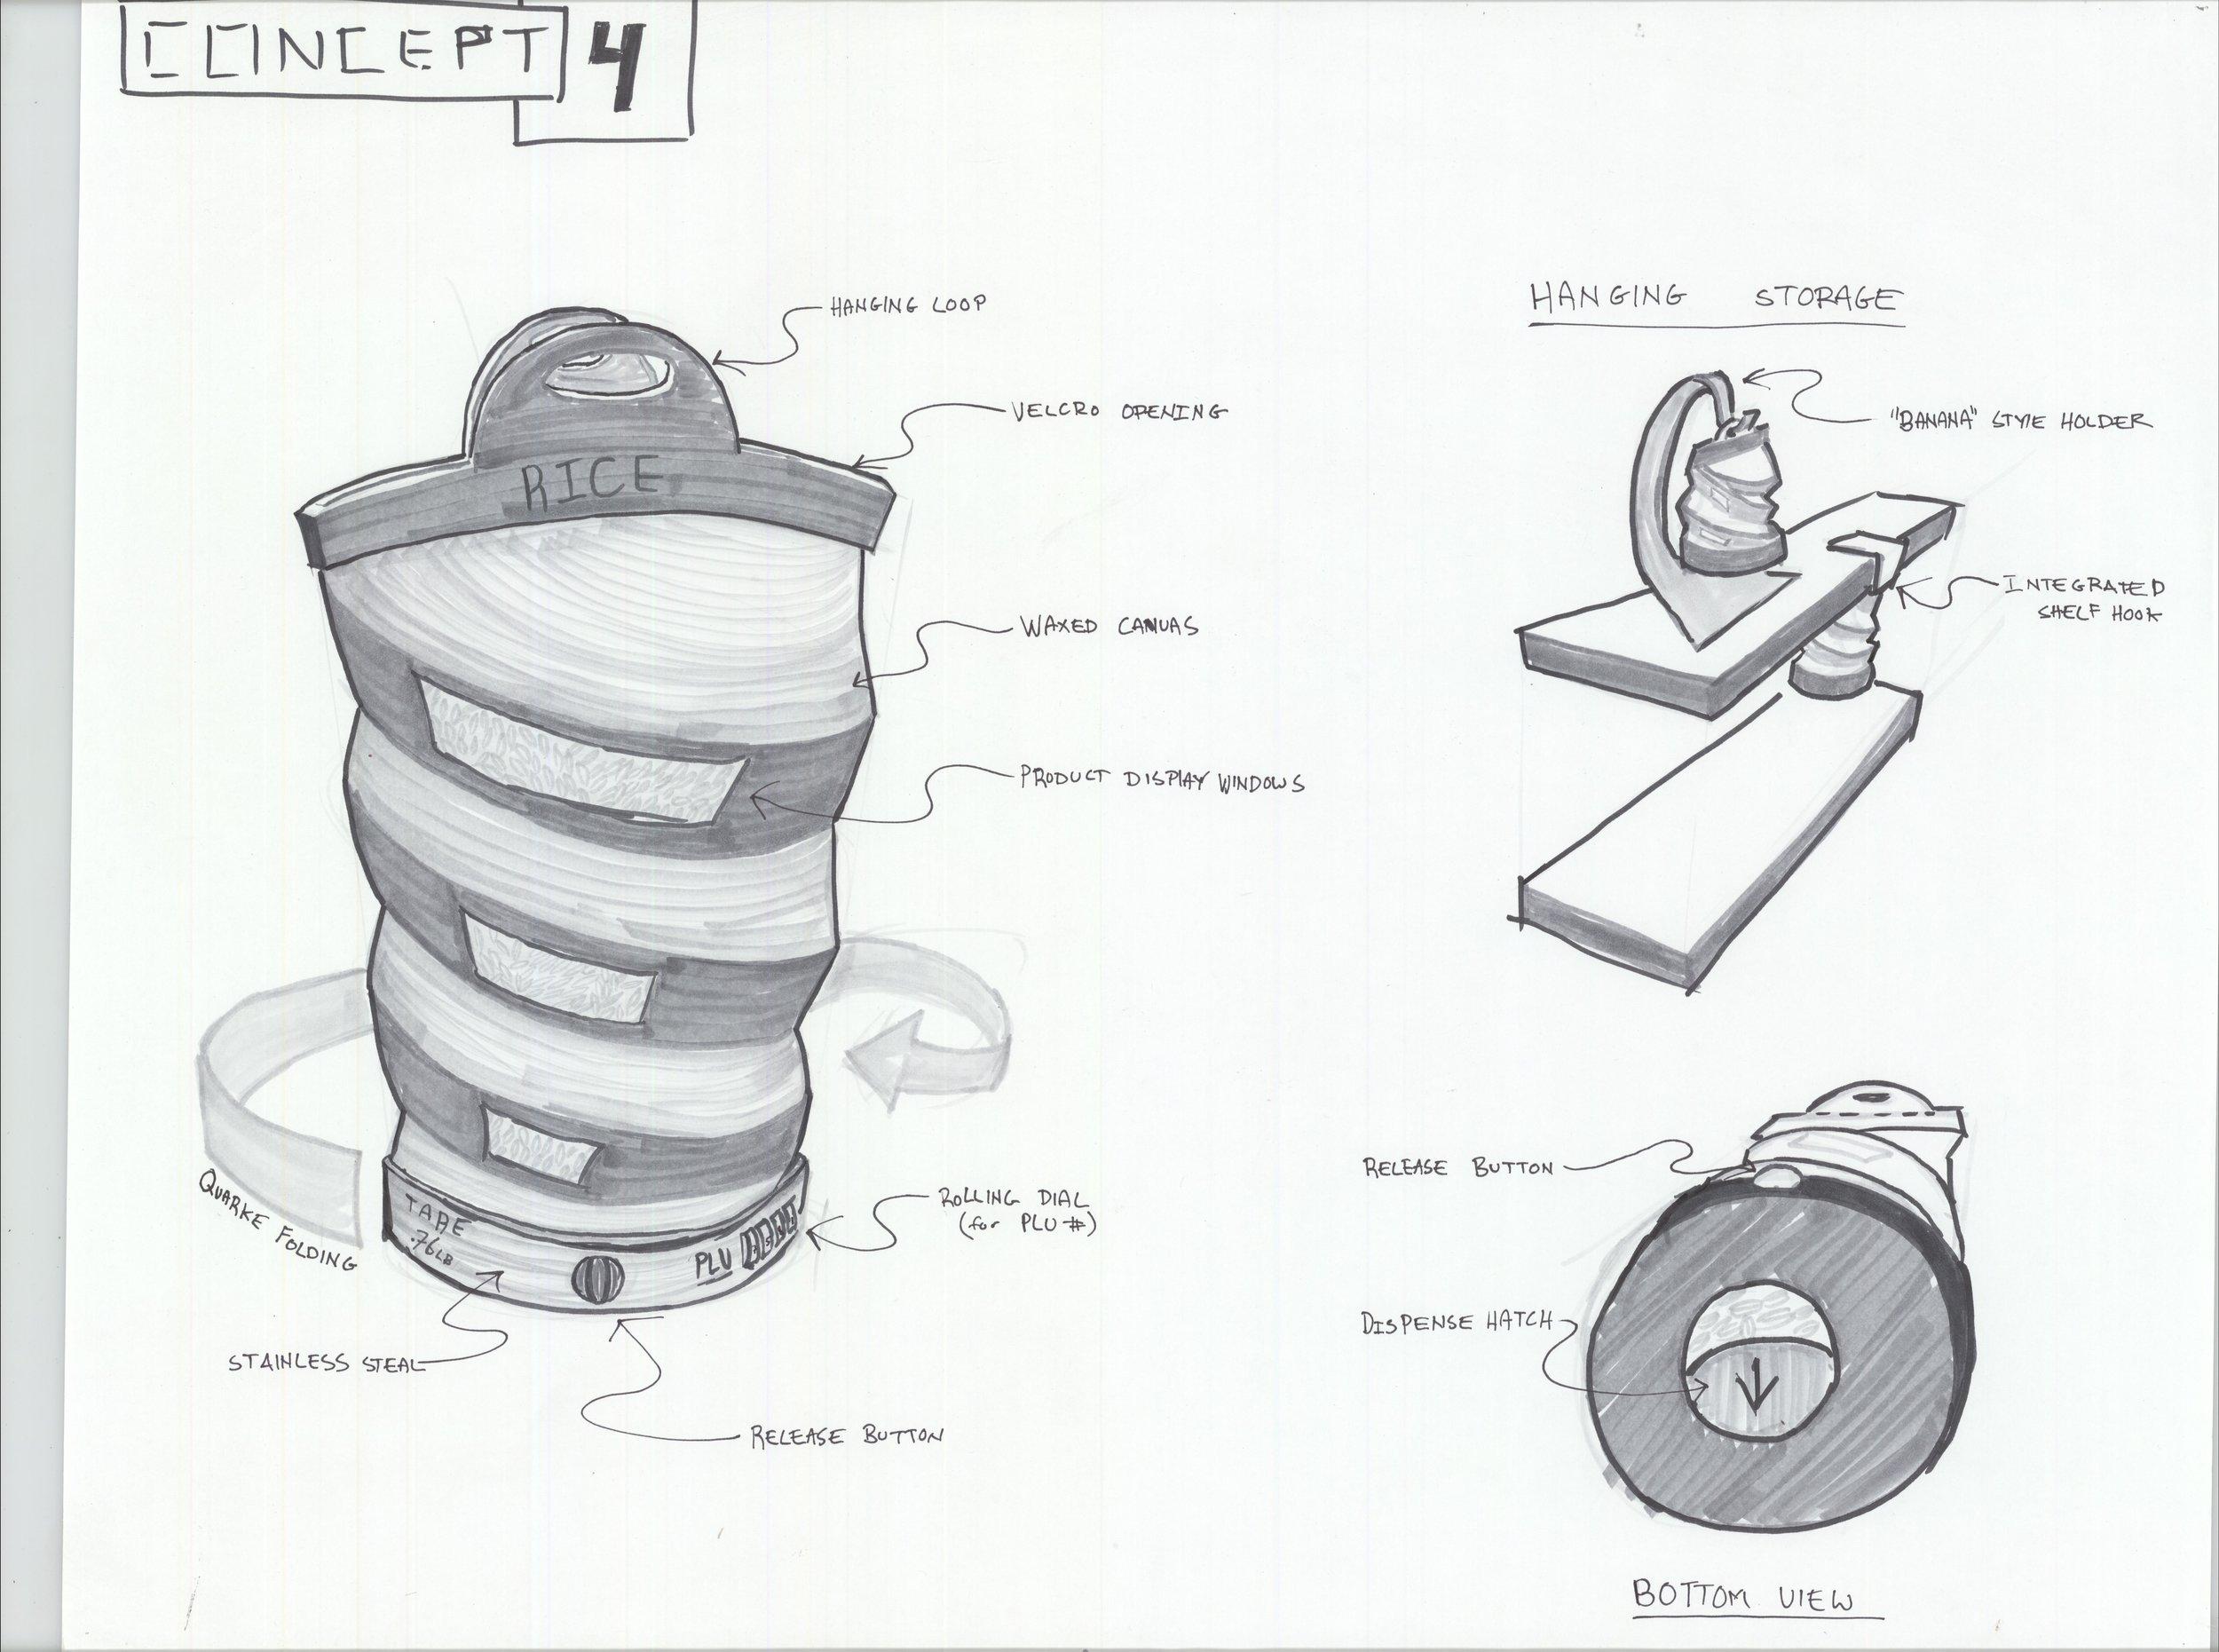 Concept 4.jpg